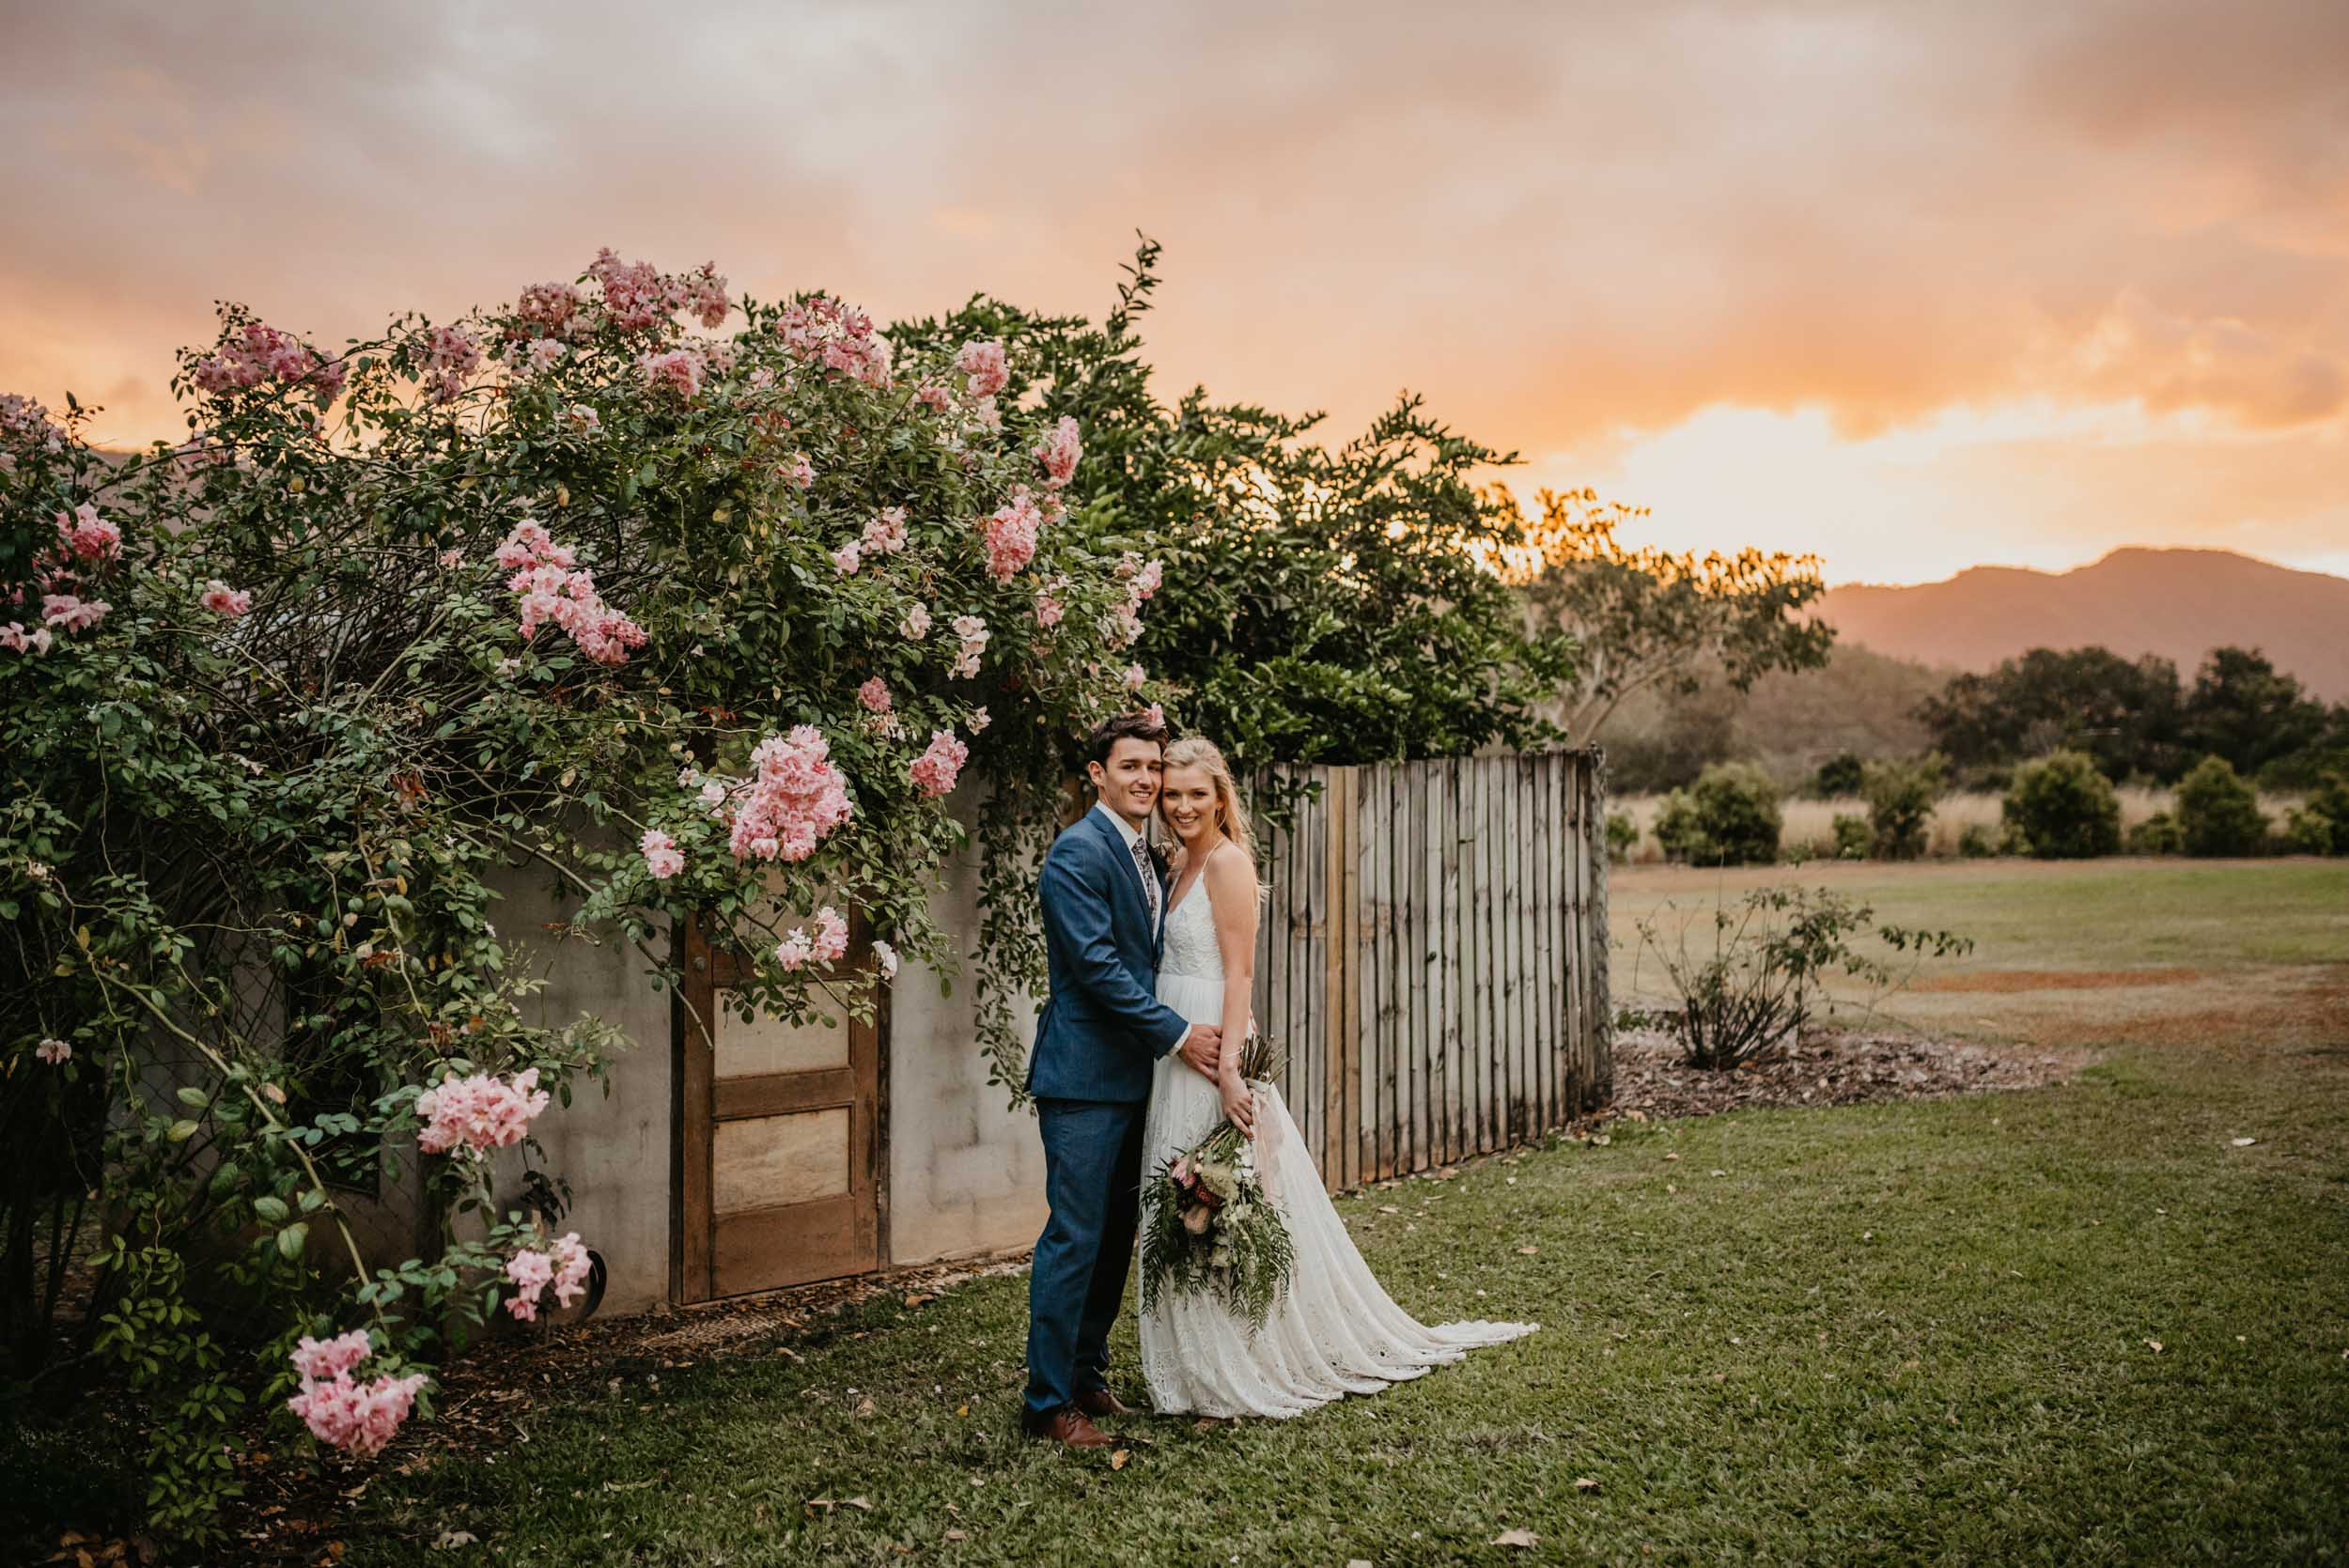 The Raw Photographer - Cairns Wedding Photographer - Laloli - Cairns Garden Wedding - Wedding Dress-77.jpg